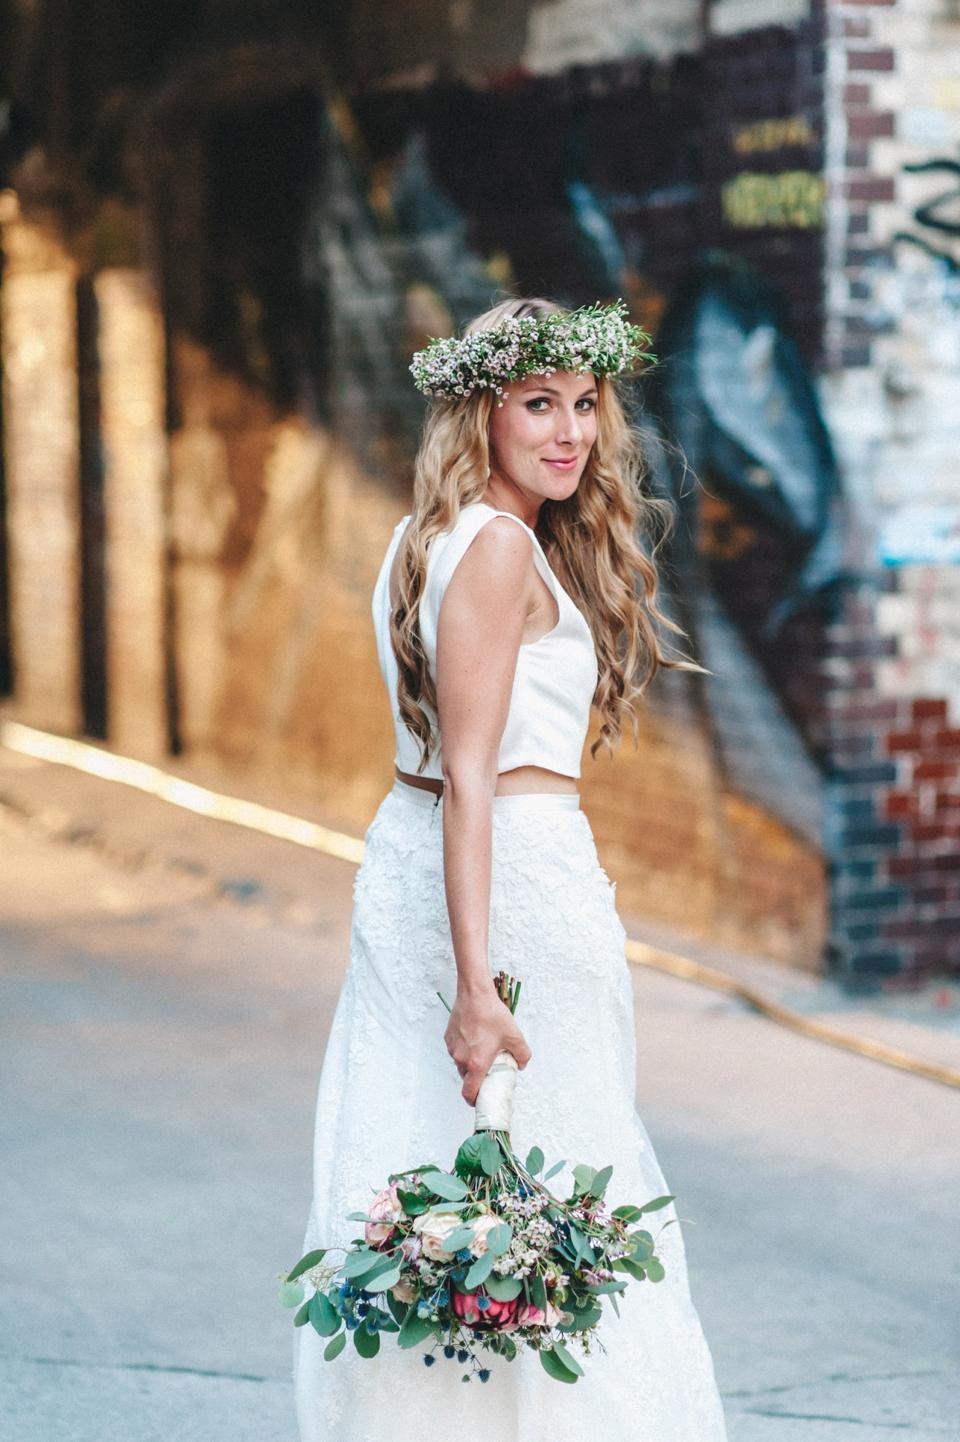 rembostyling-weddinginspiration-kreativ-wedding-wedding-belin-loft23_0384